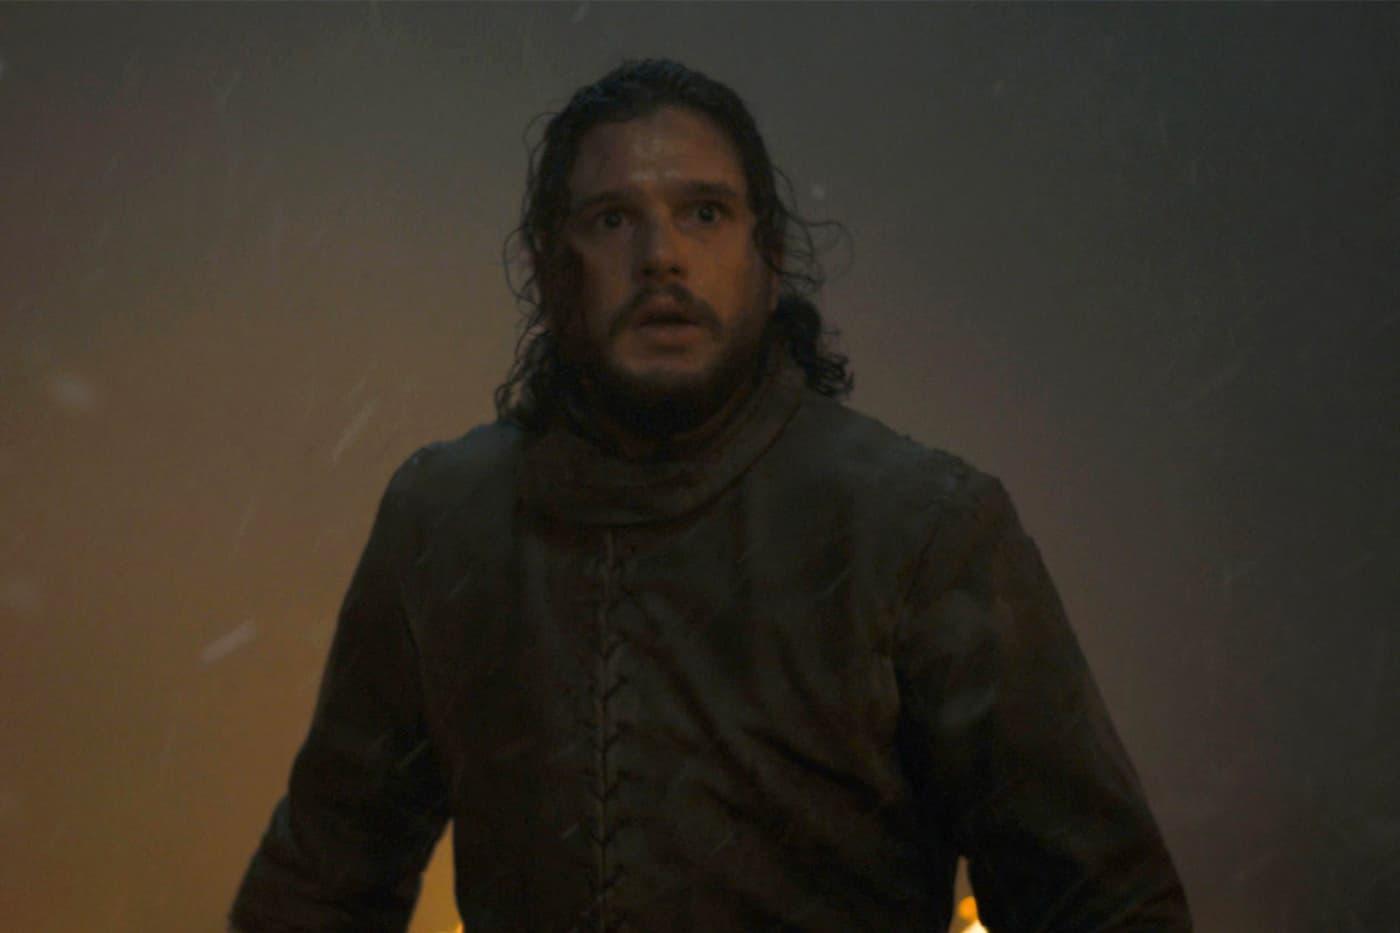 HBO Offers a Sneak Peek at 'Game of Thrones' Season 8 Episode 3